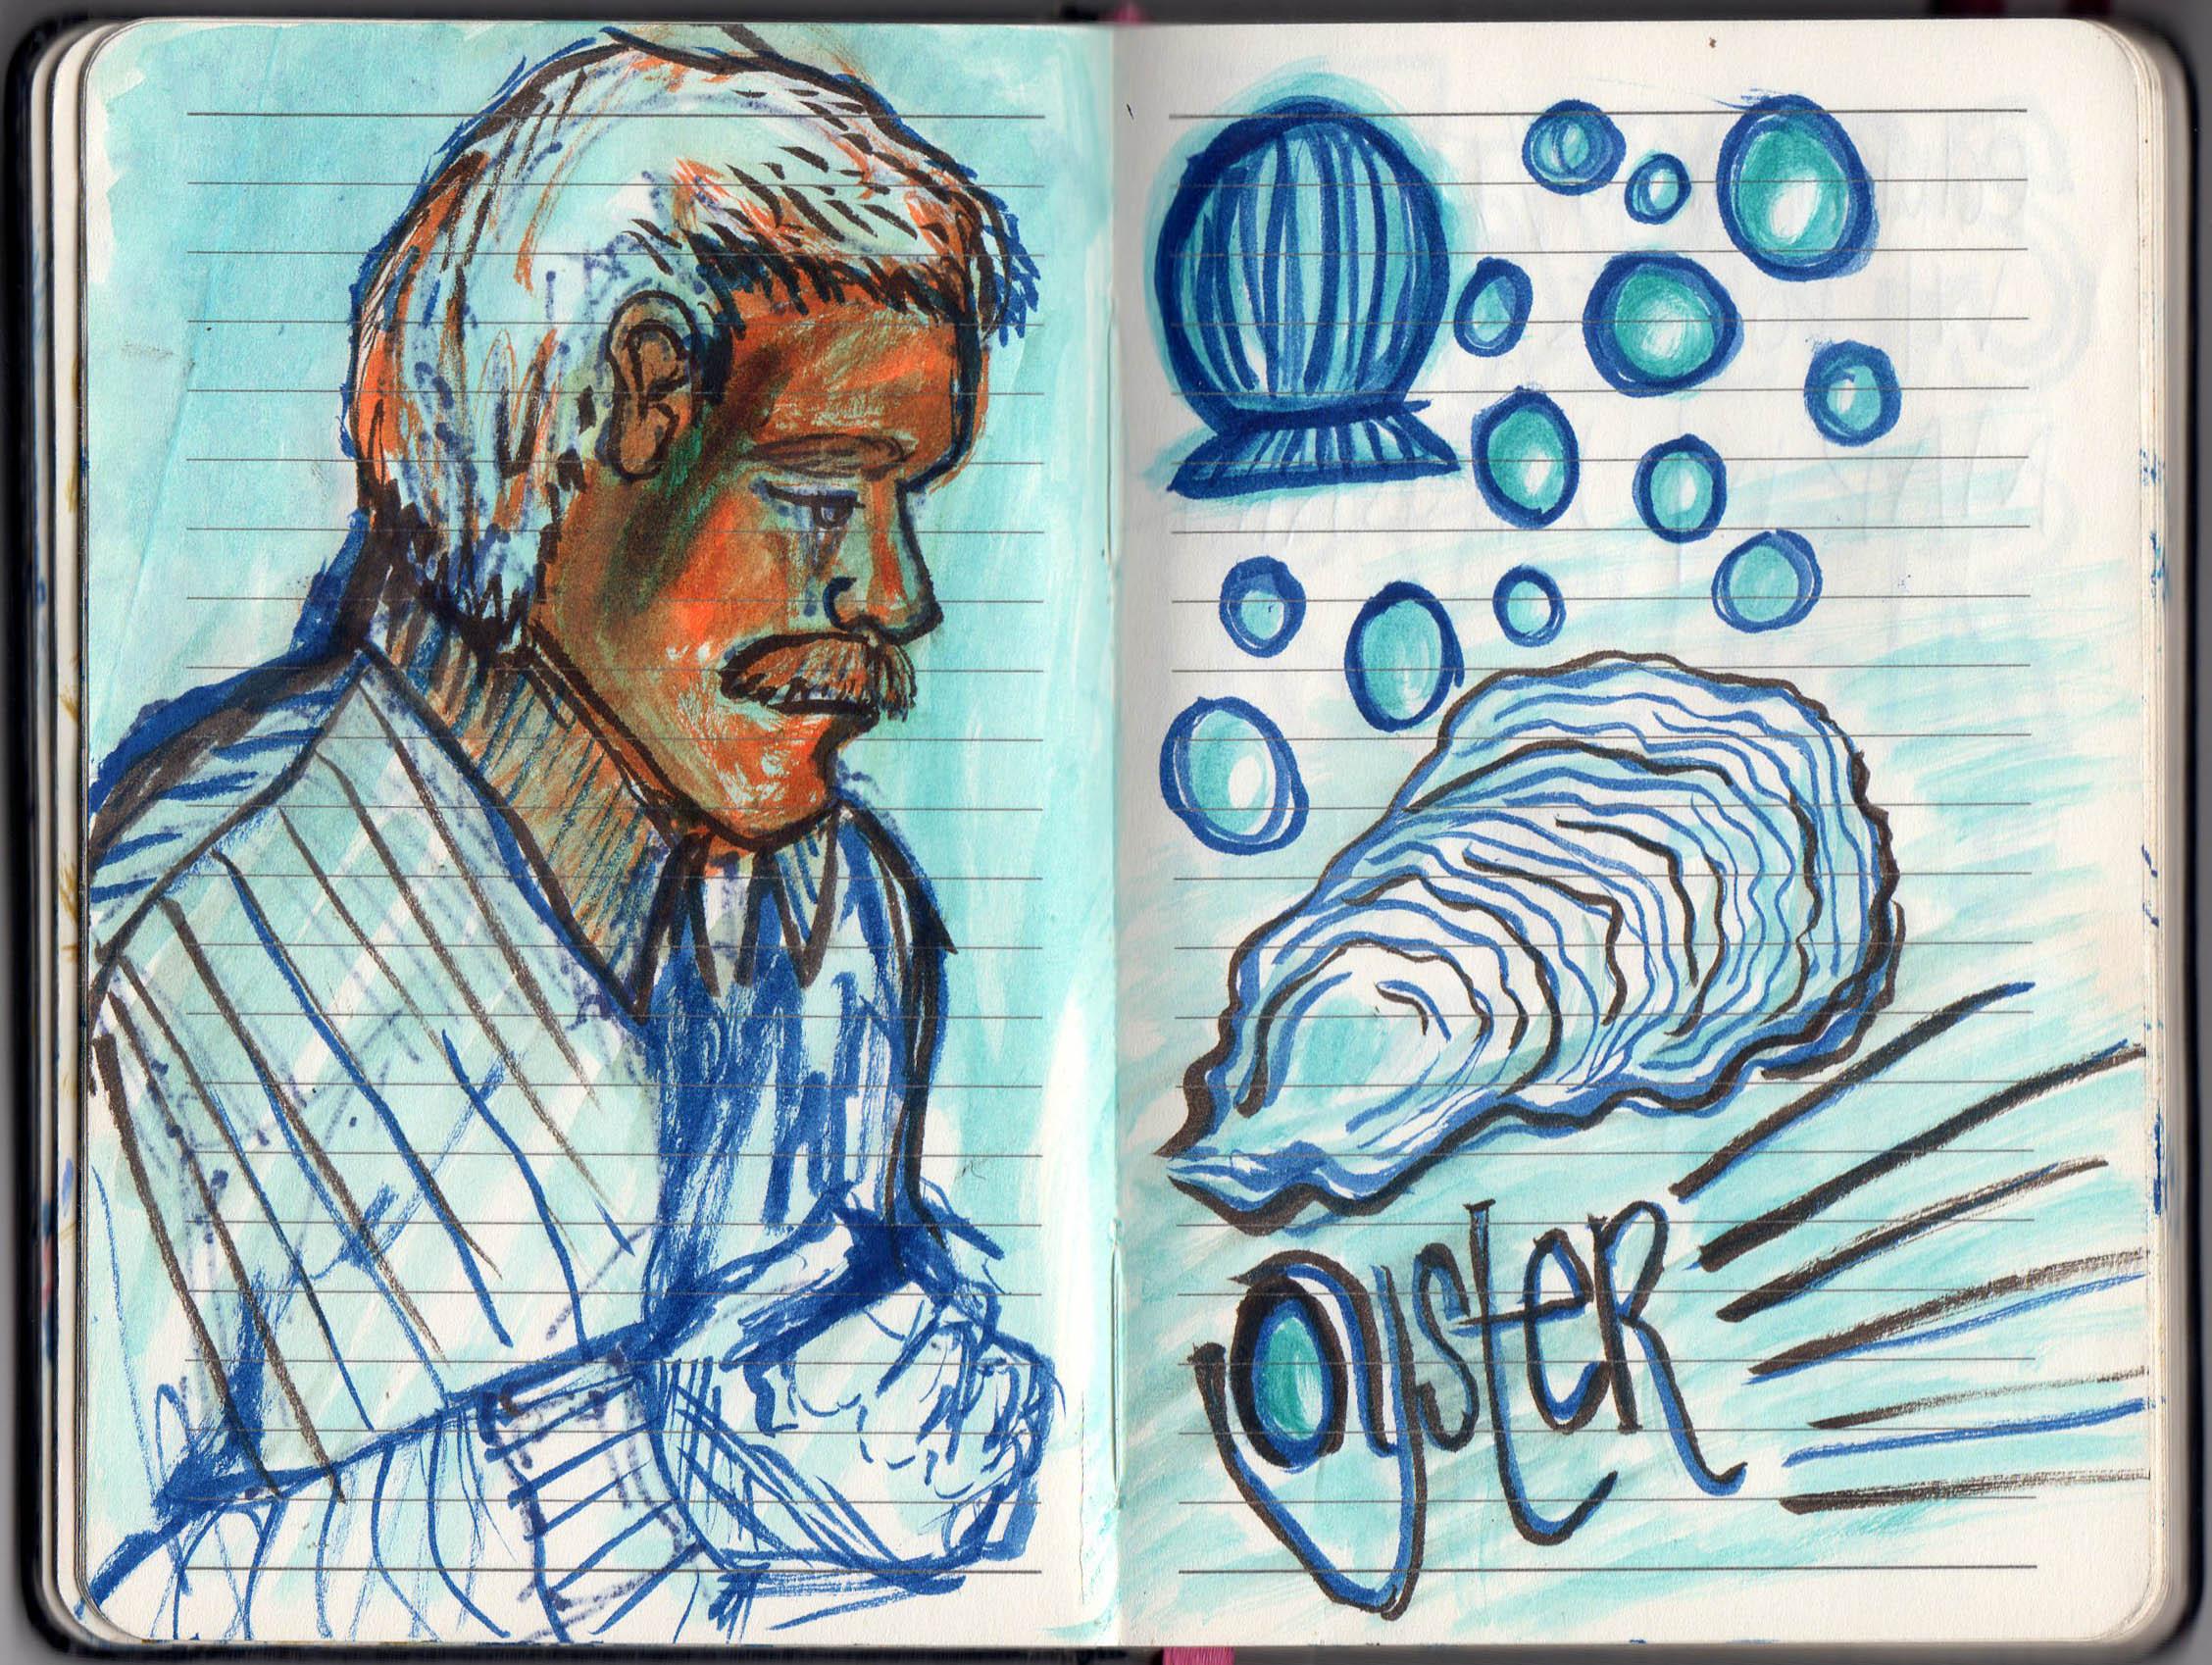 oysterman.jpg